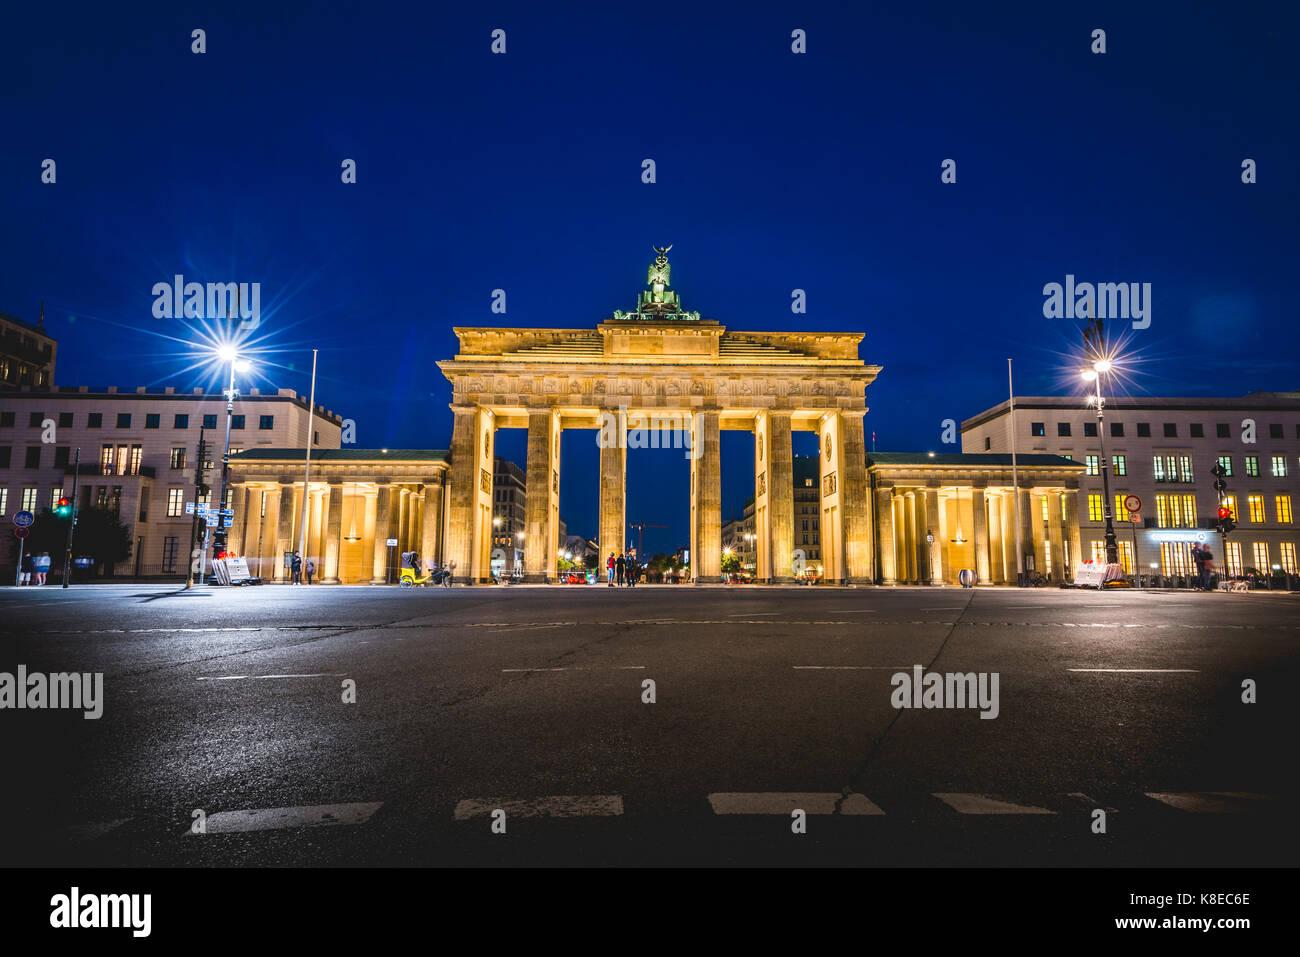 Brandenburg Gate at night, illuminated, Berlin-Mitte, Berlin, Germany - Stock Image